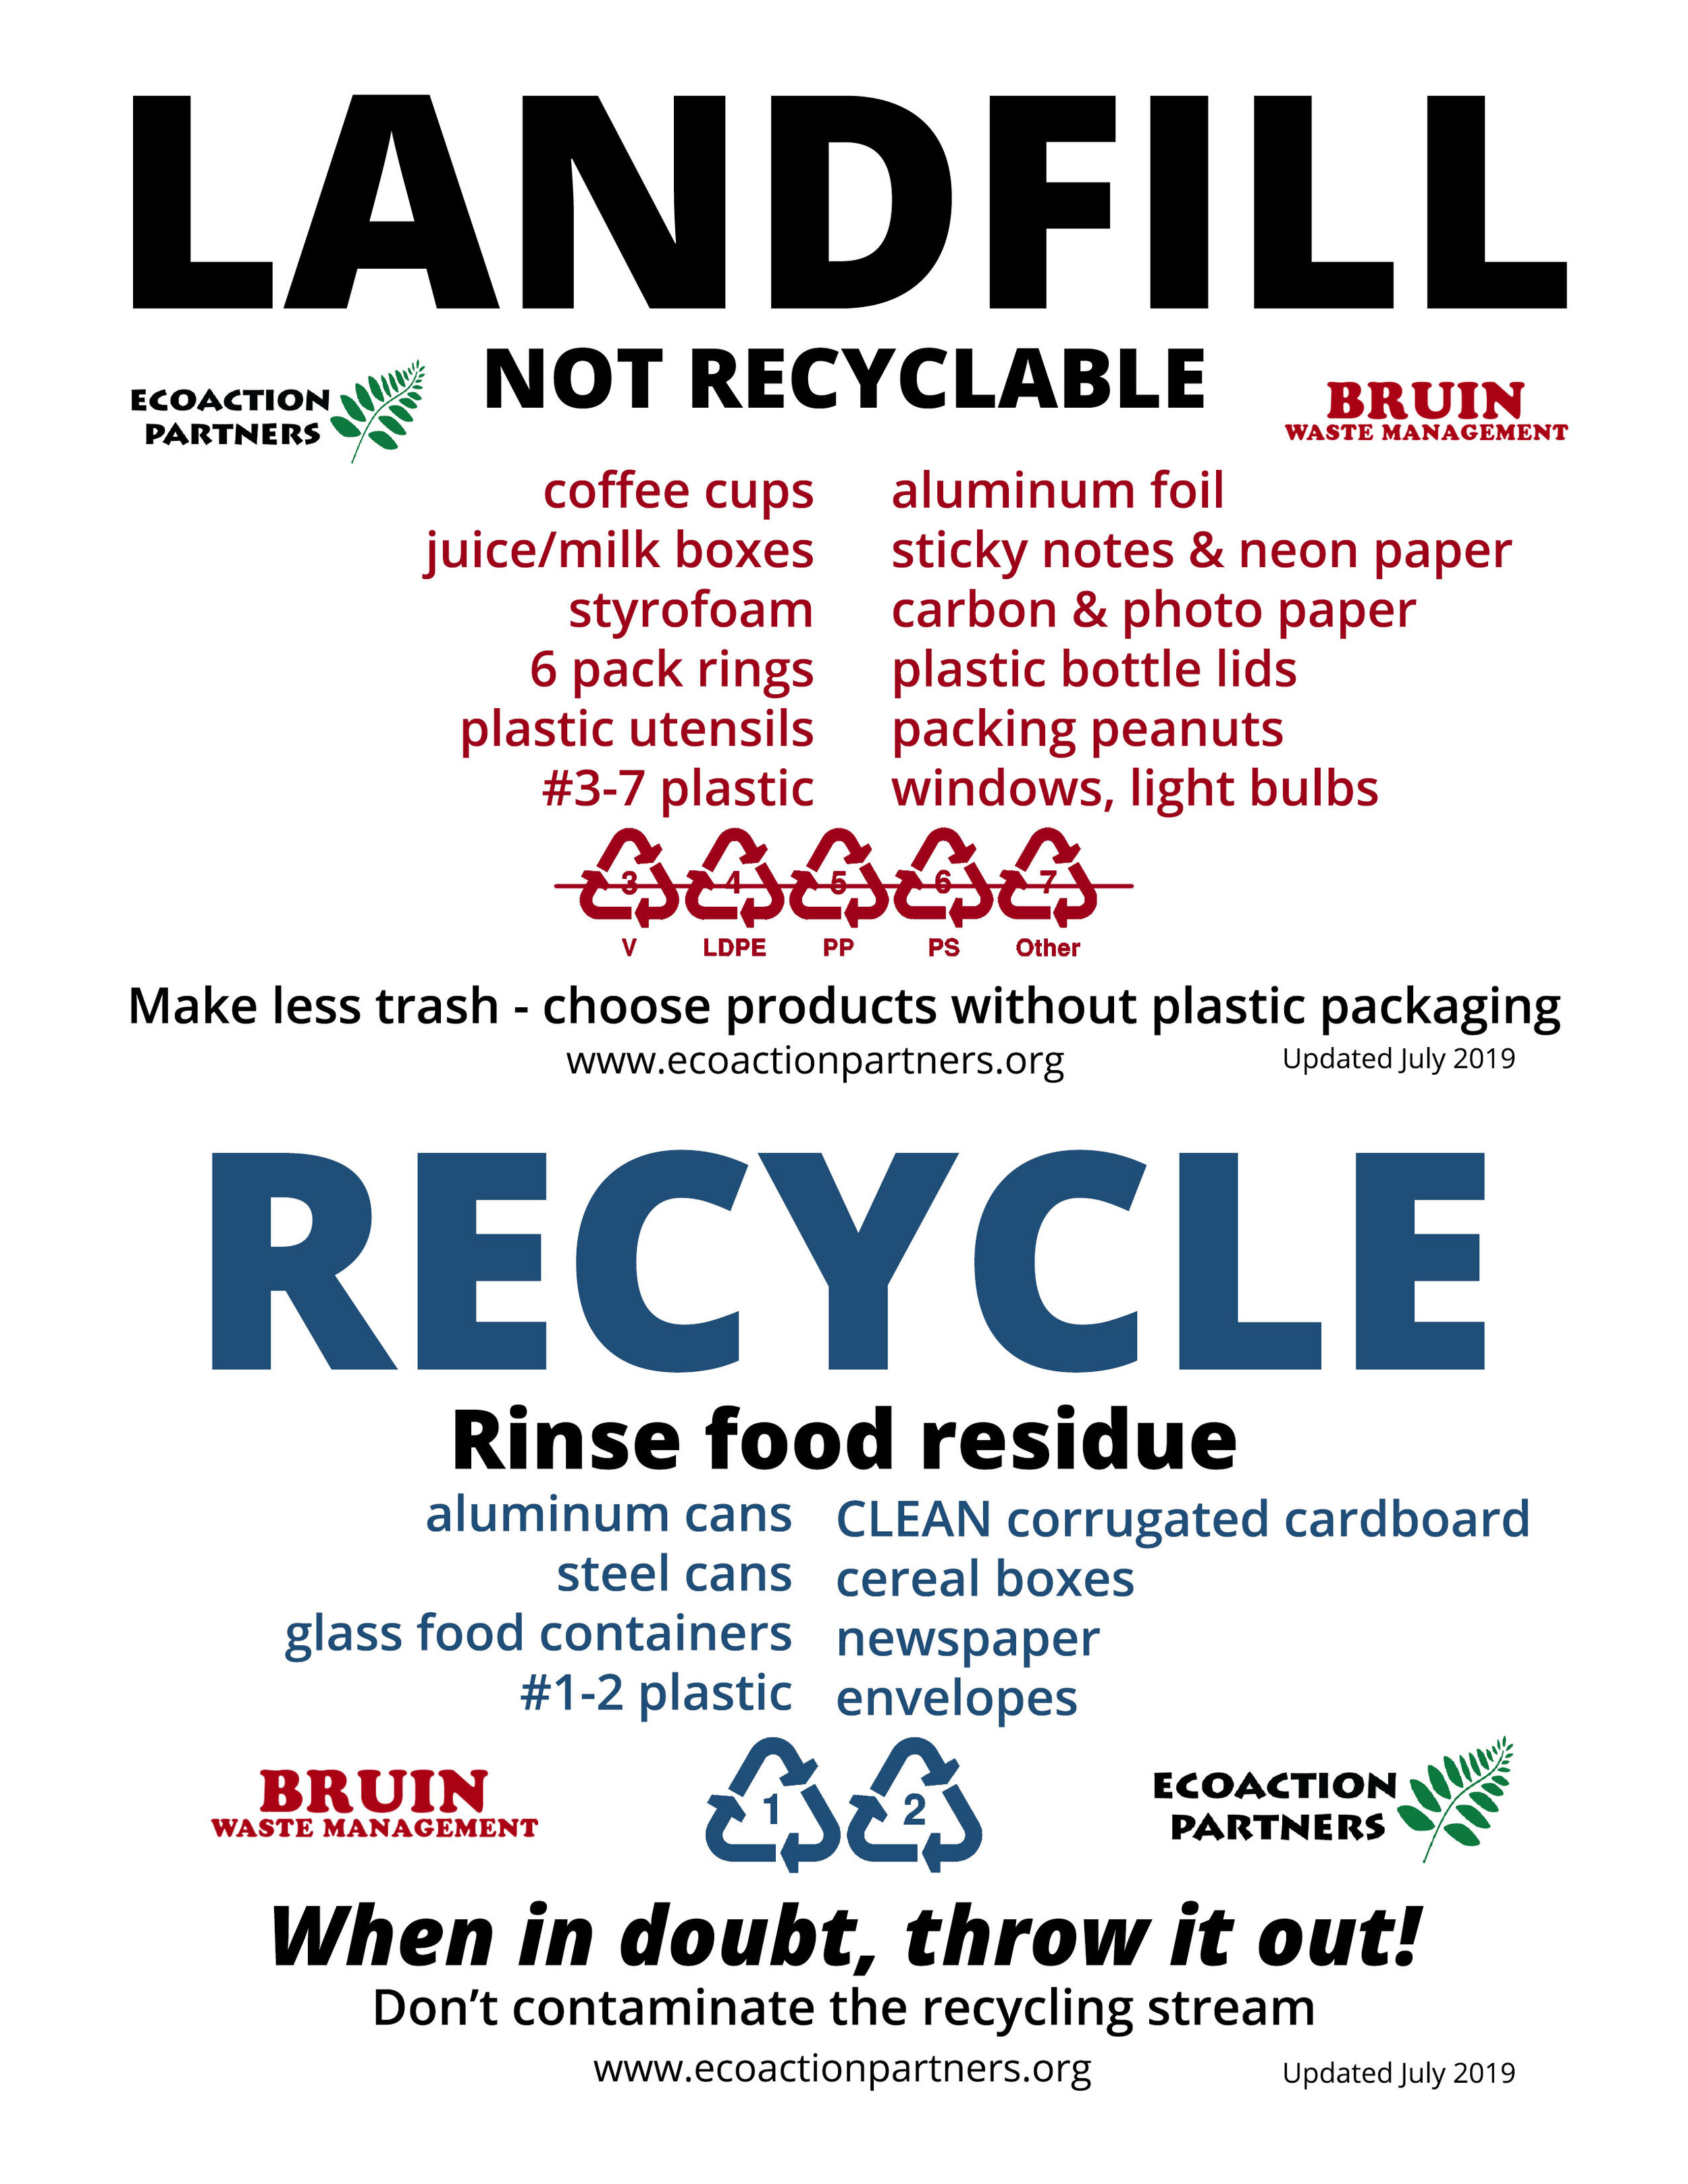 Bruin Landfill Recycle Guide-web.jpg